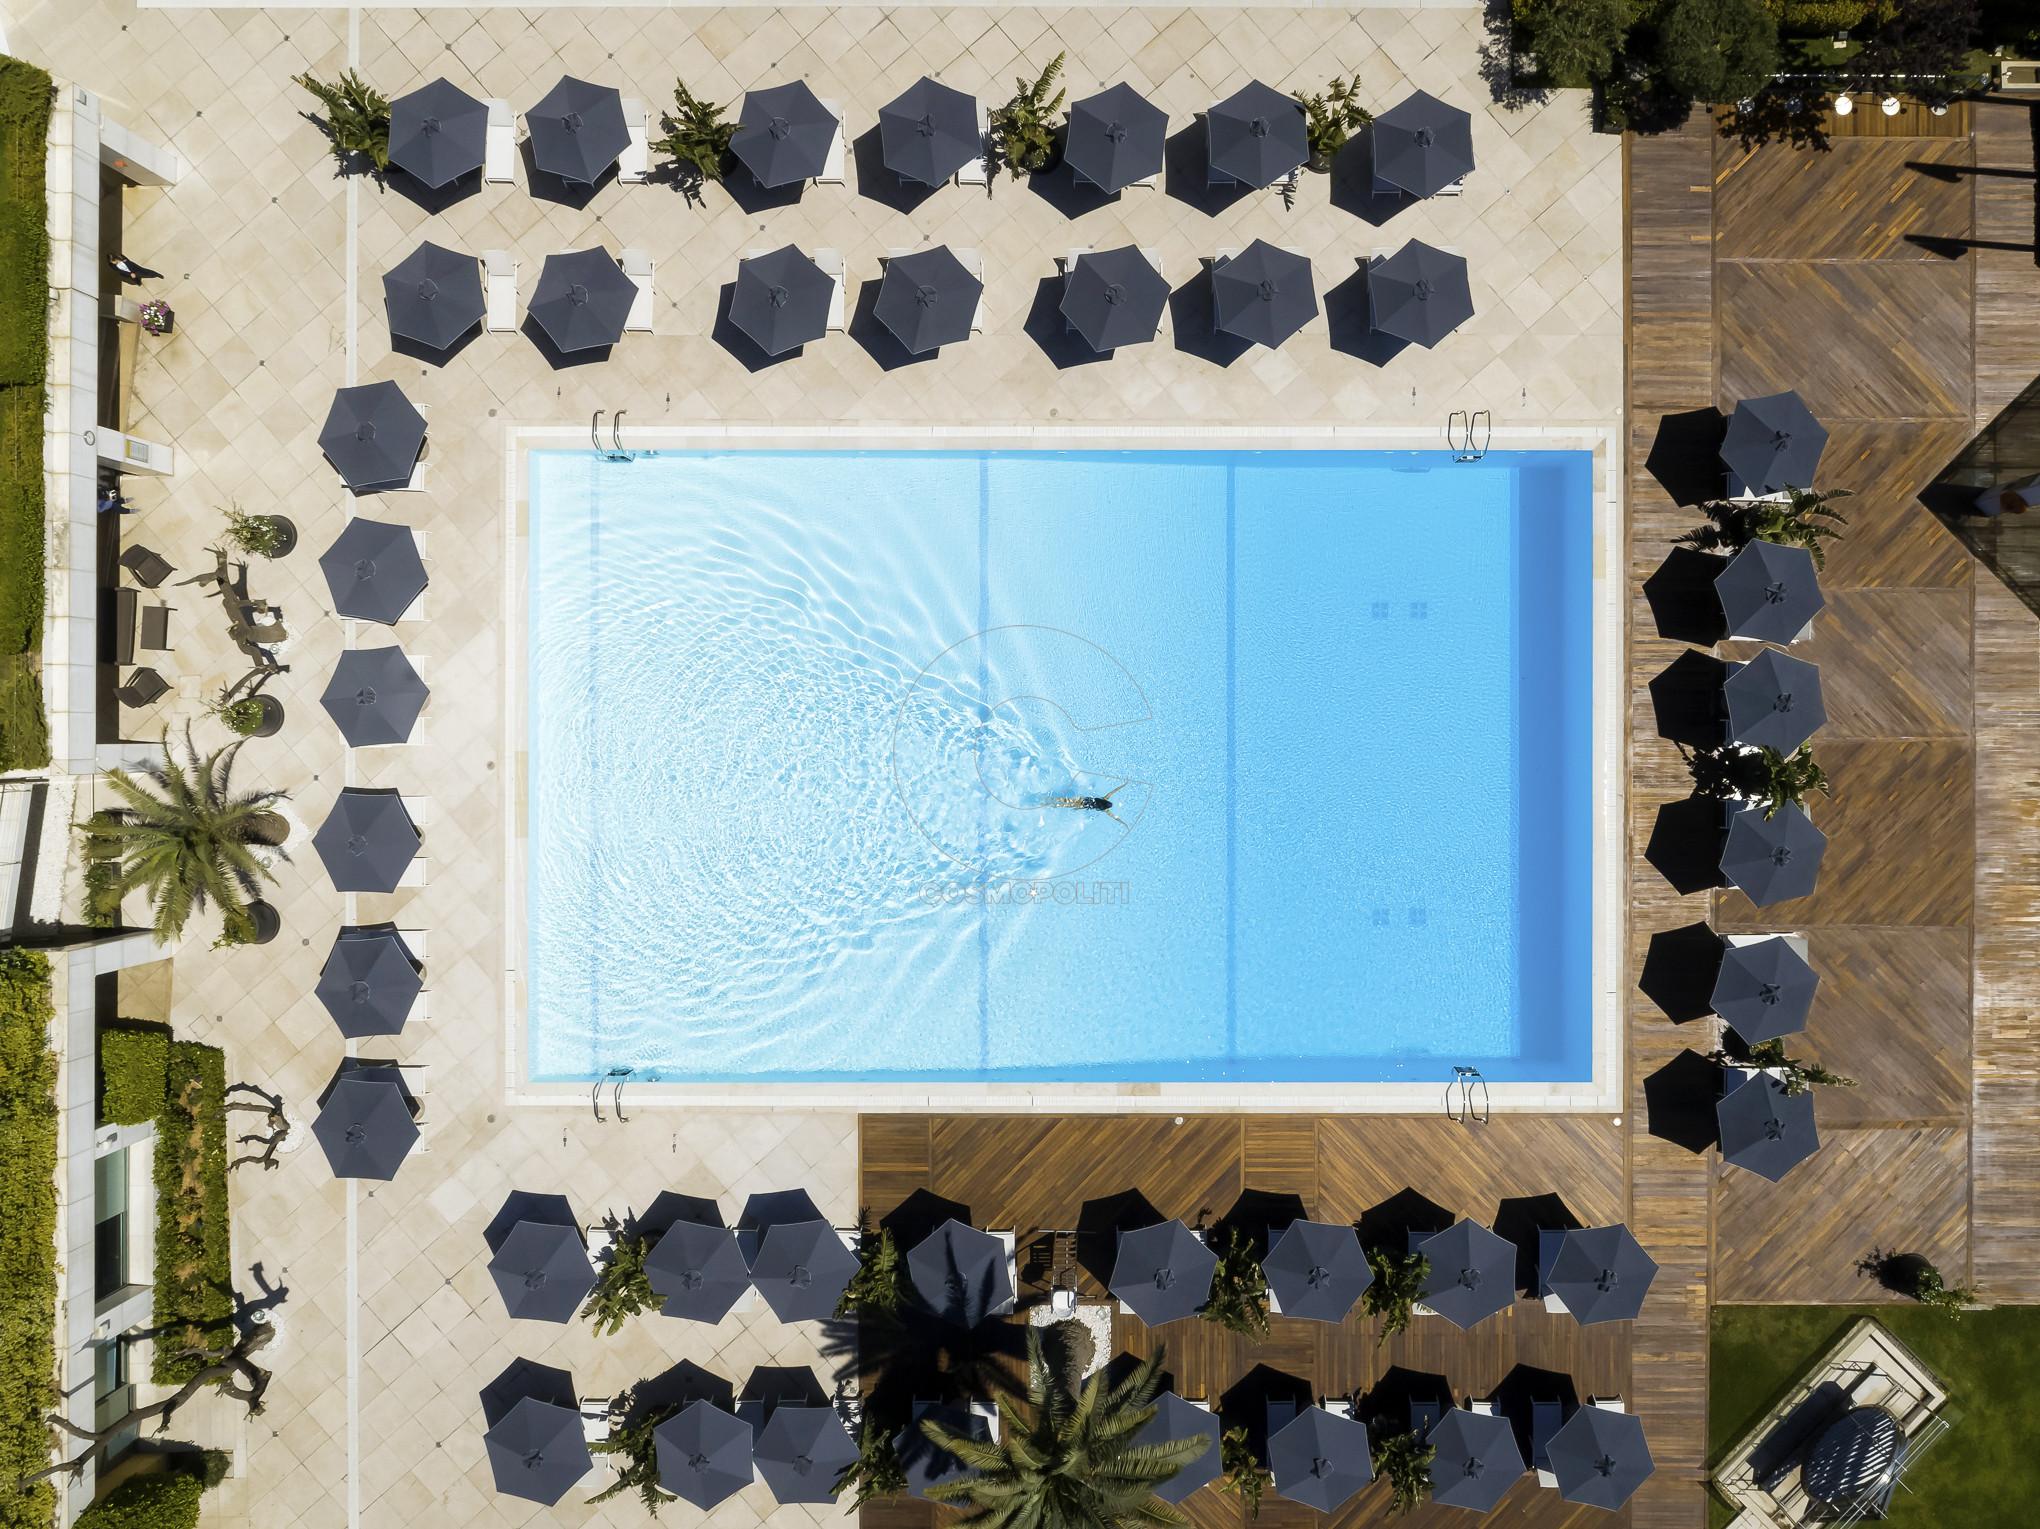 Hilton_Drone_Photo_Pool